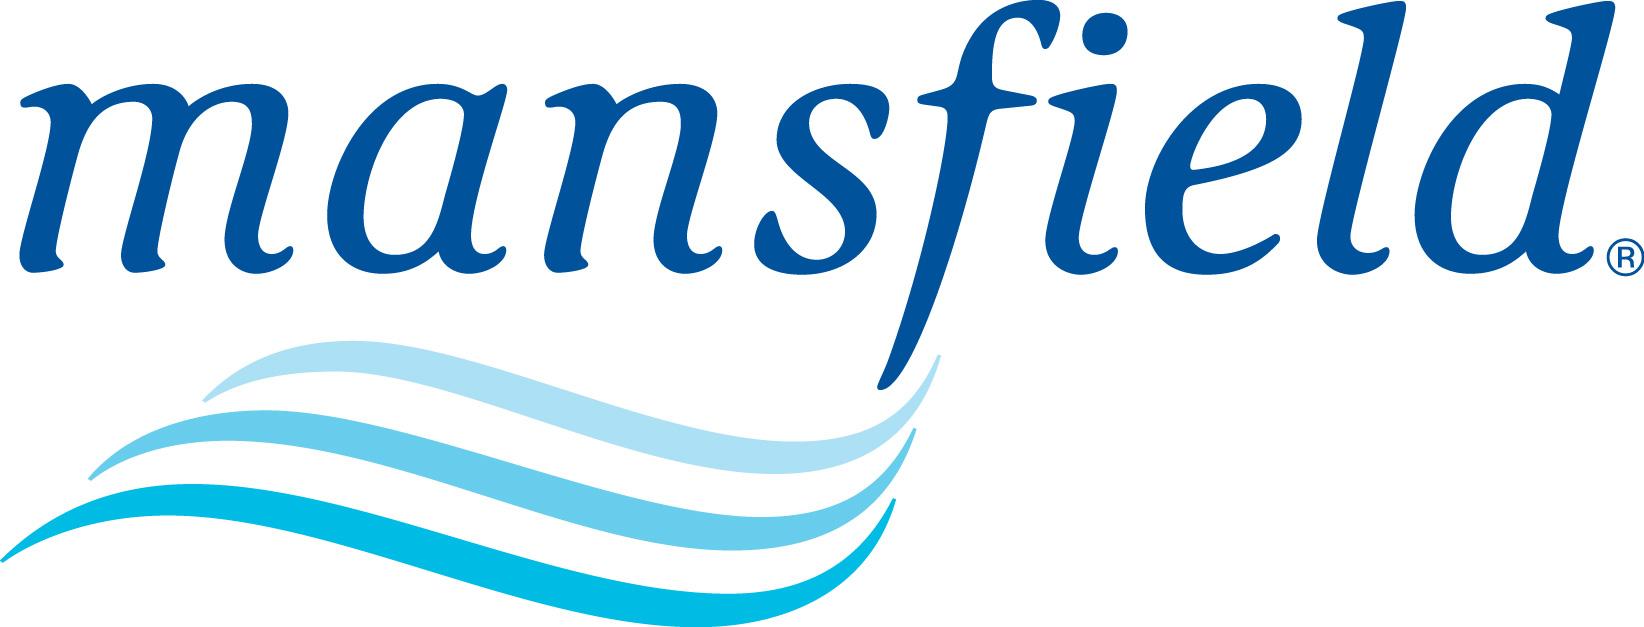 mansfield-logo.jpg